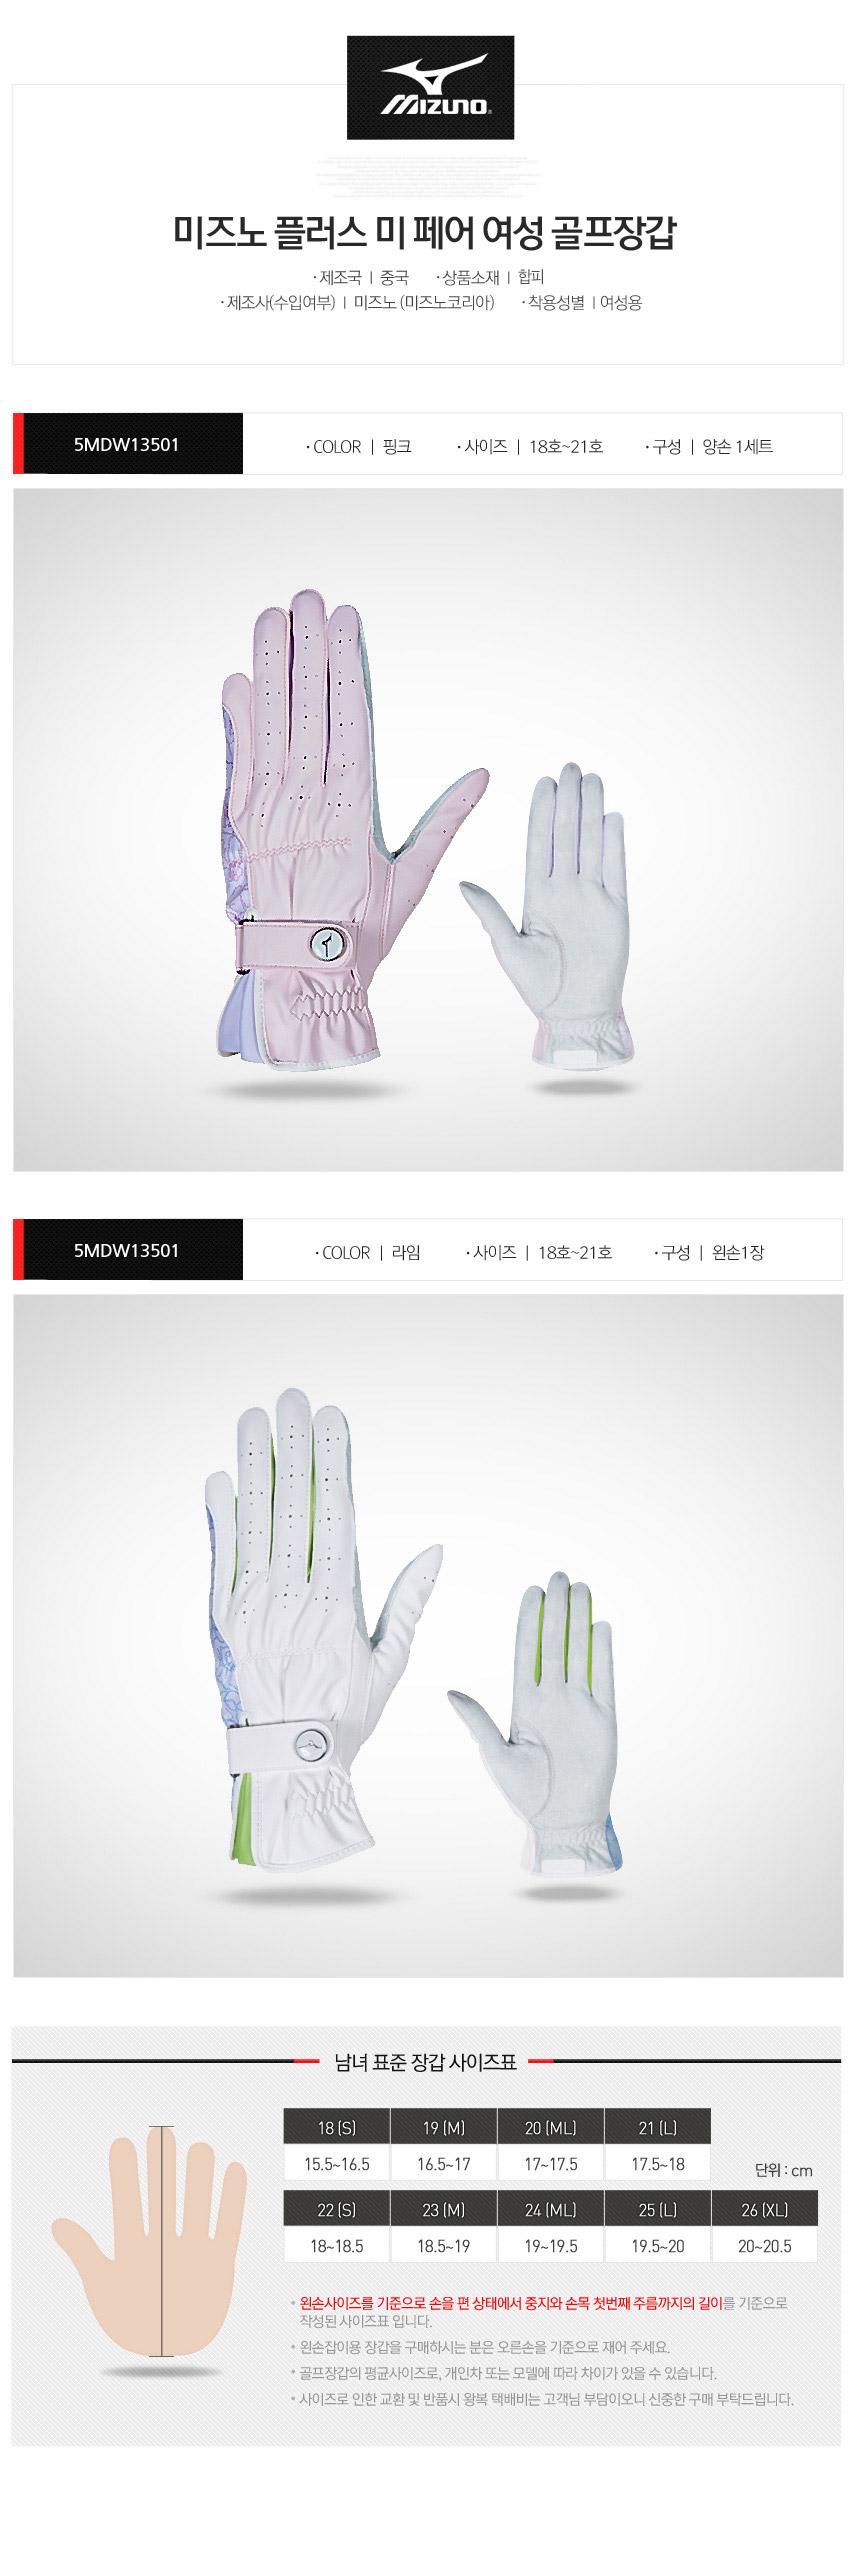 mizuno_2015_me_pair_glove.jpg